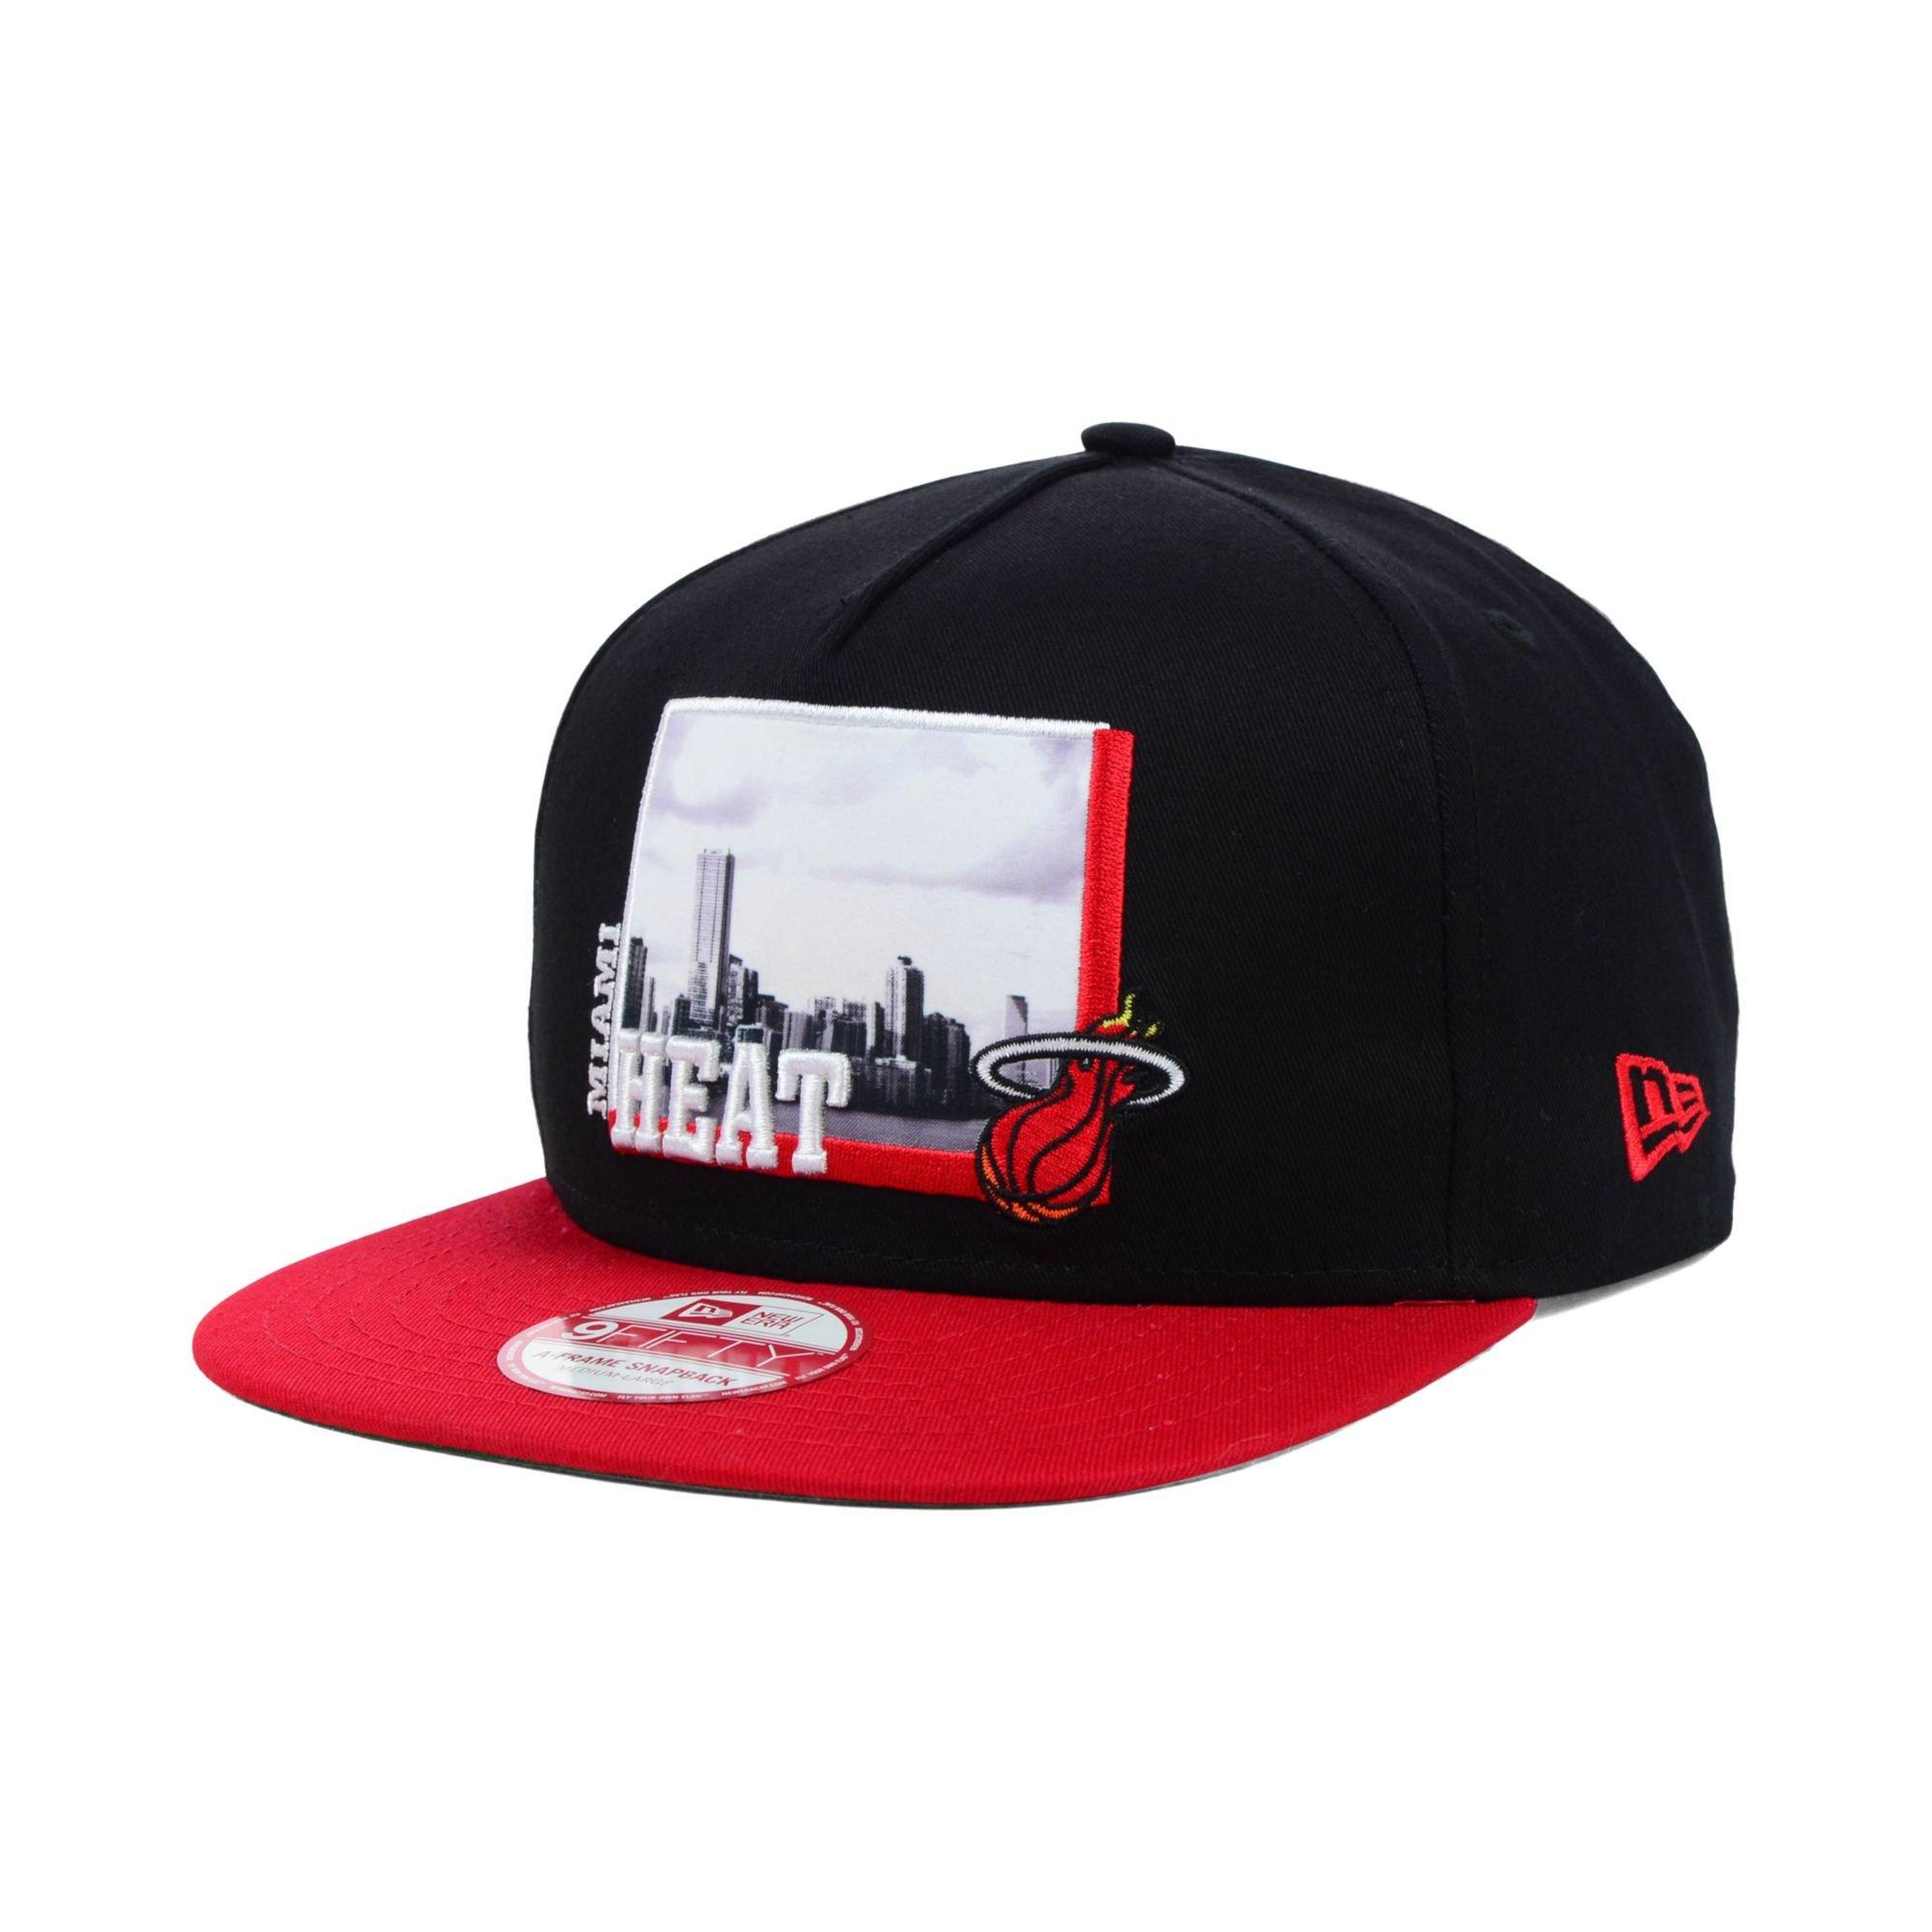 san francisco 86d5b 4d8b2 KTZ Miami Heat Nba Hardwood Classics 9fifty Snapback Cap in Black ...